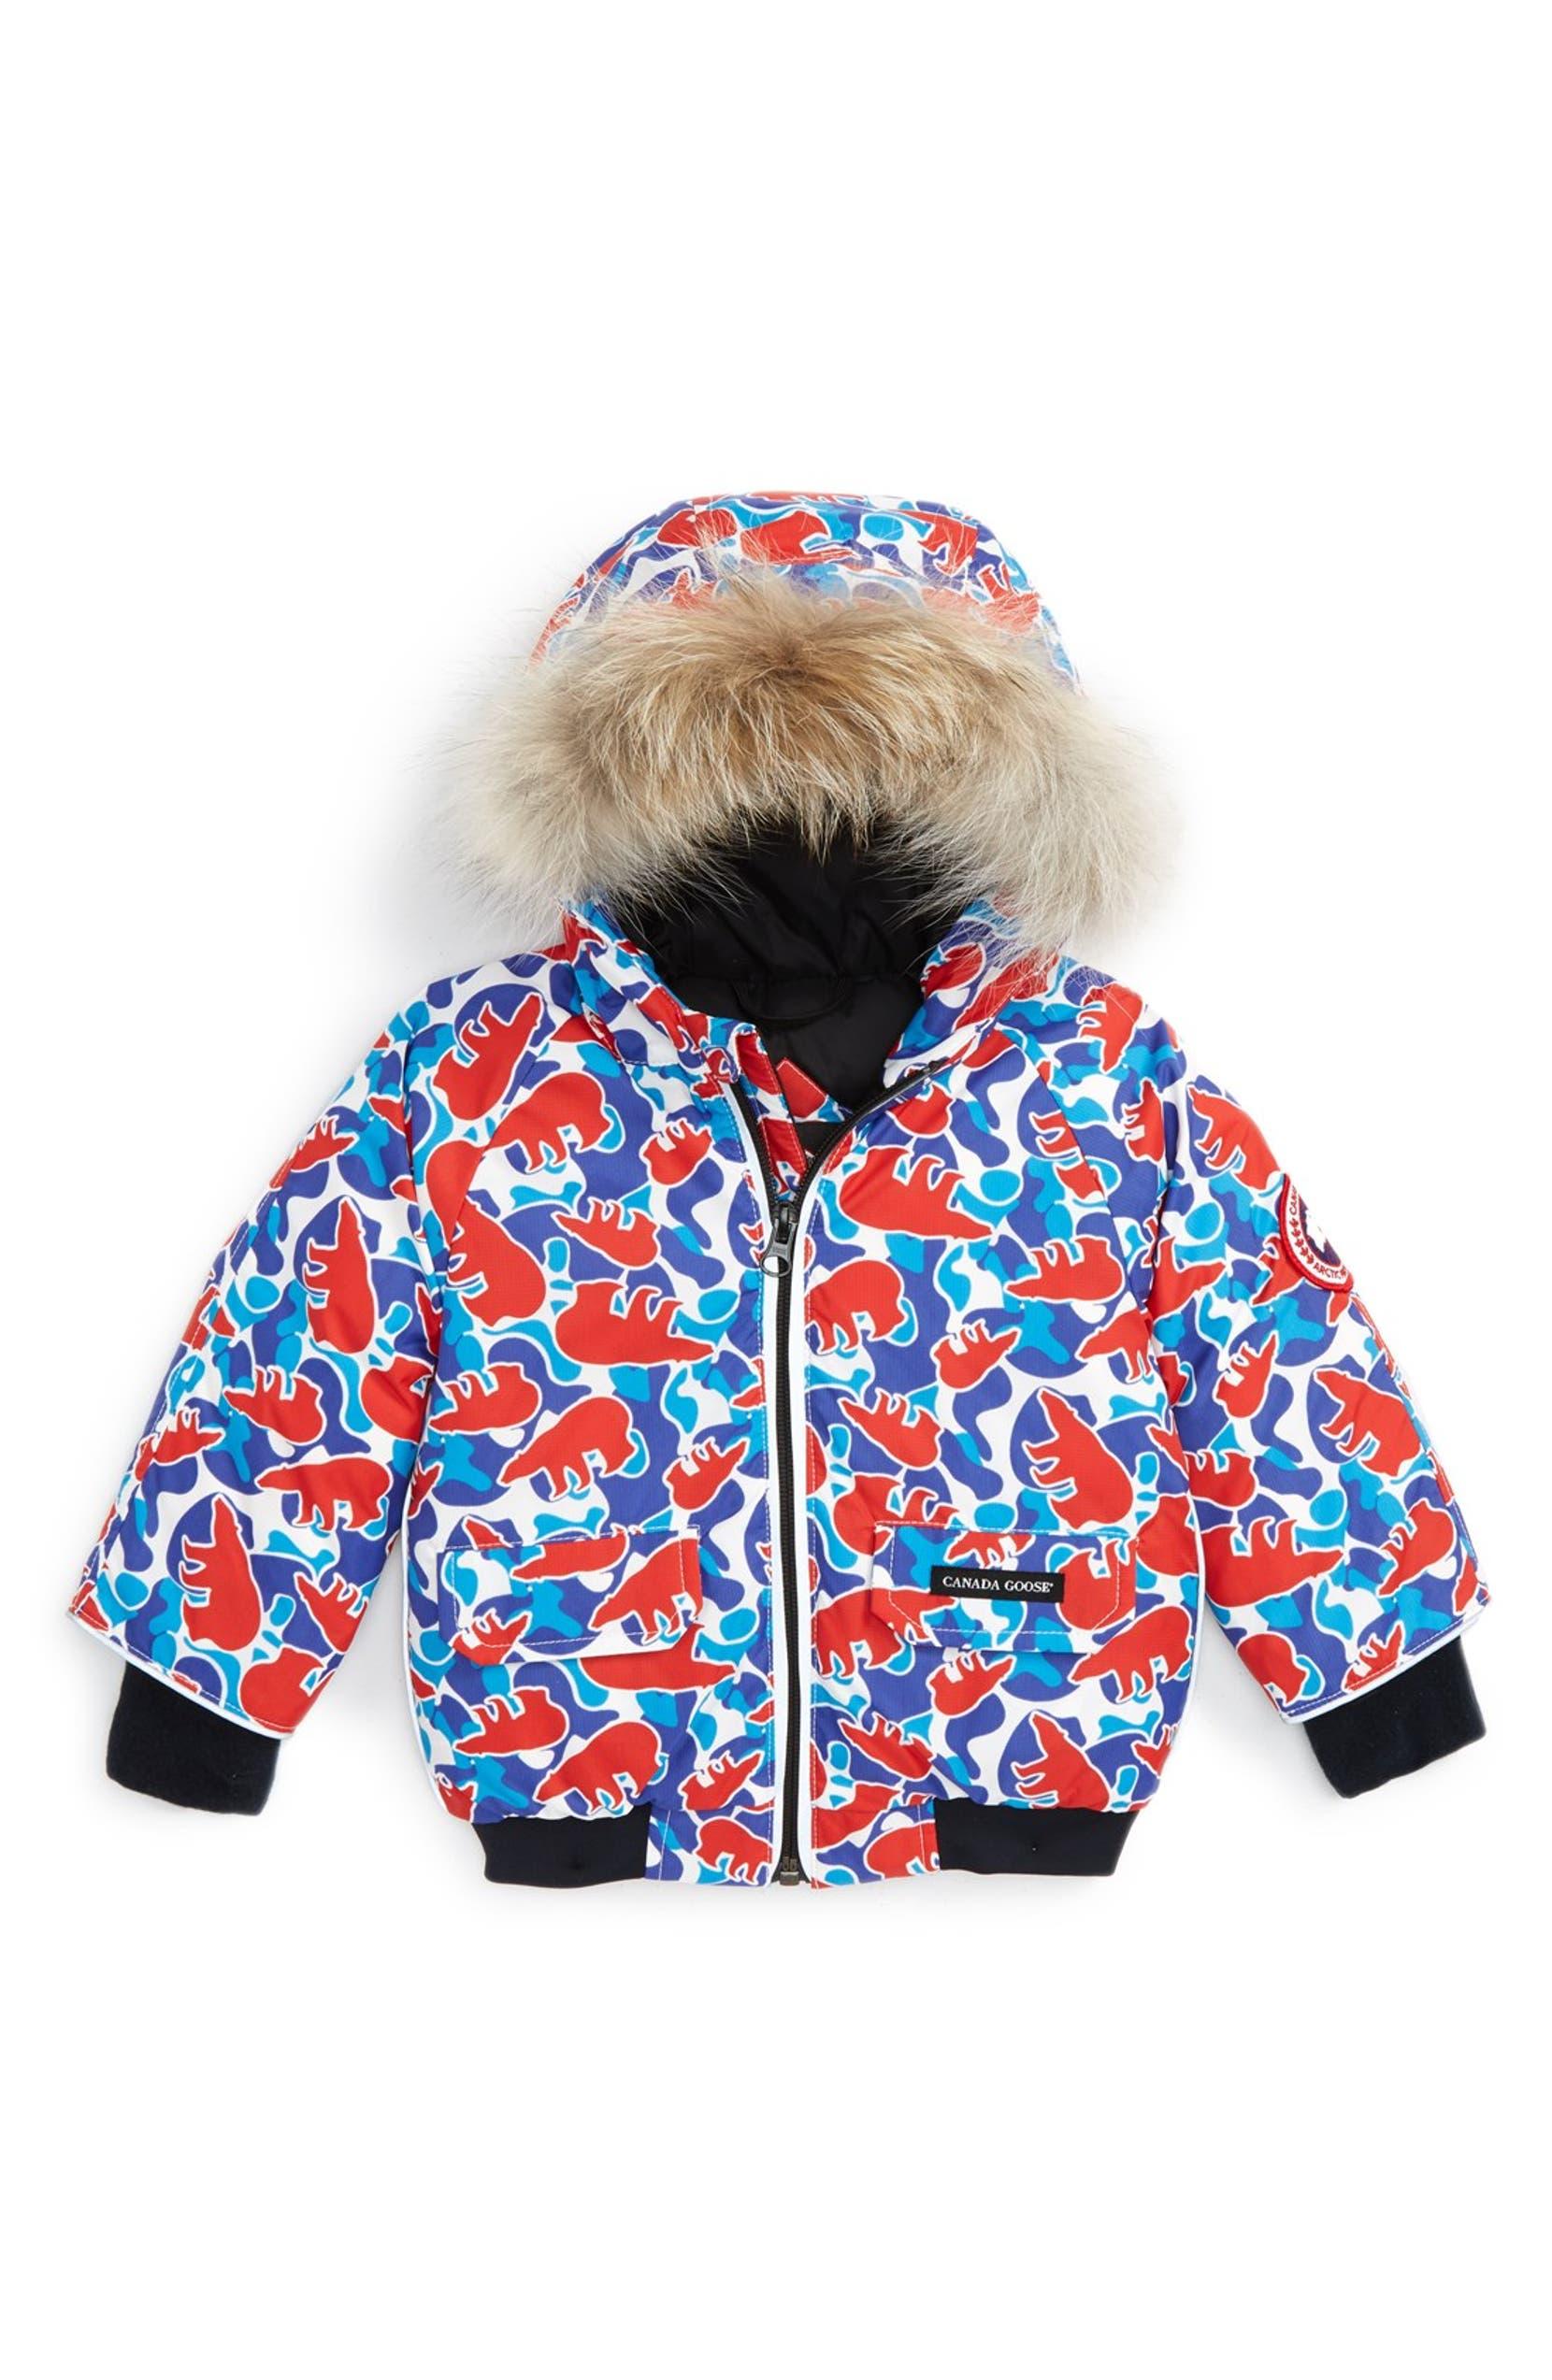 ad16a182581b elijah bomber jacket canada goose